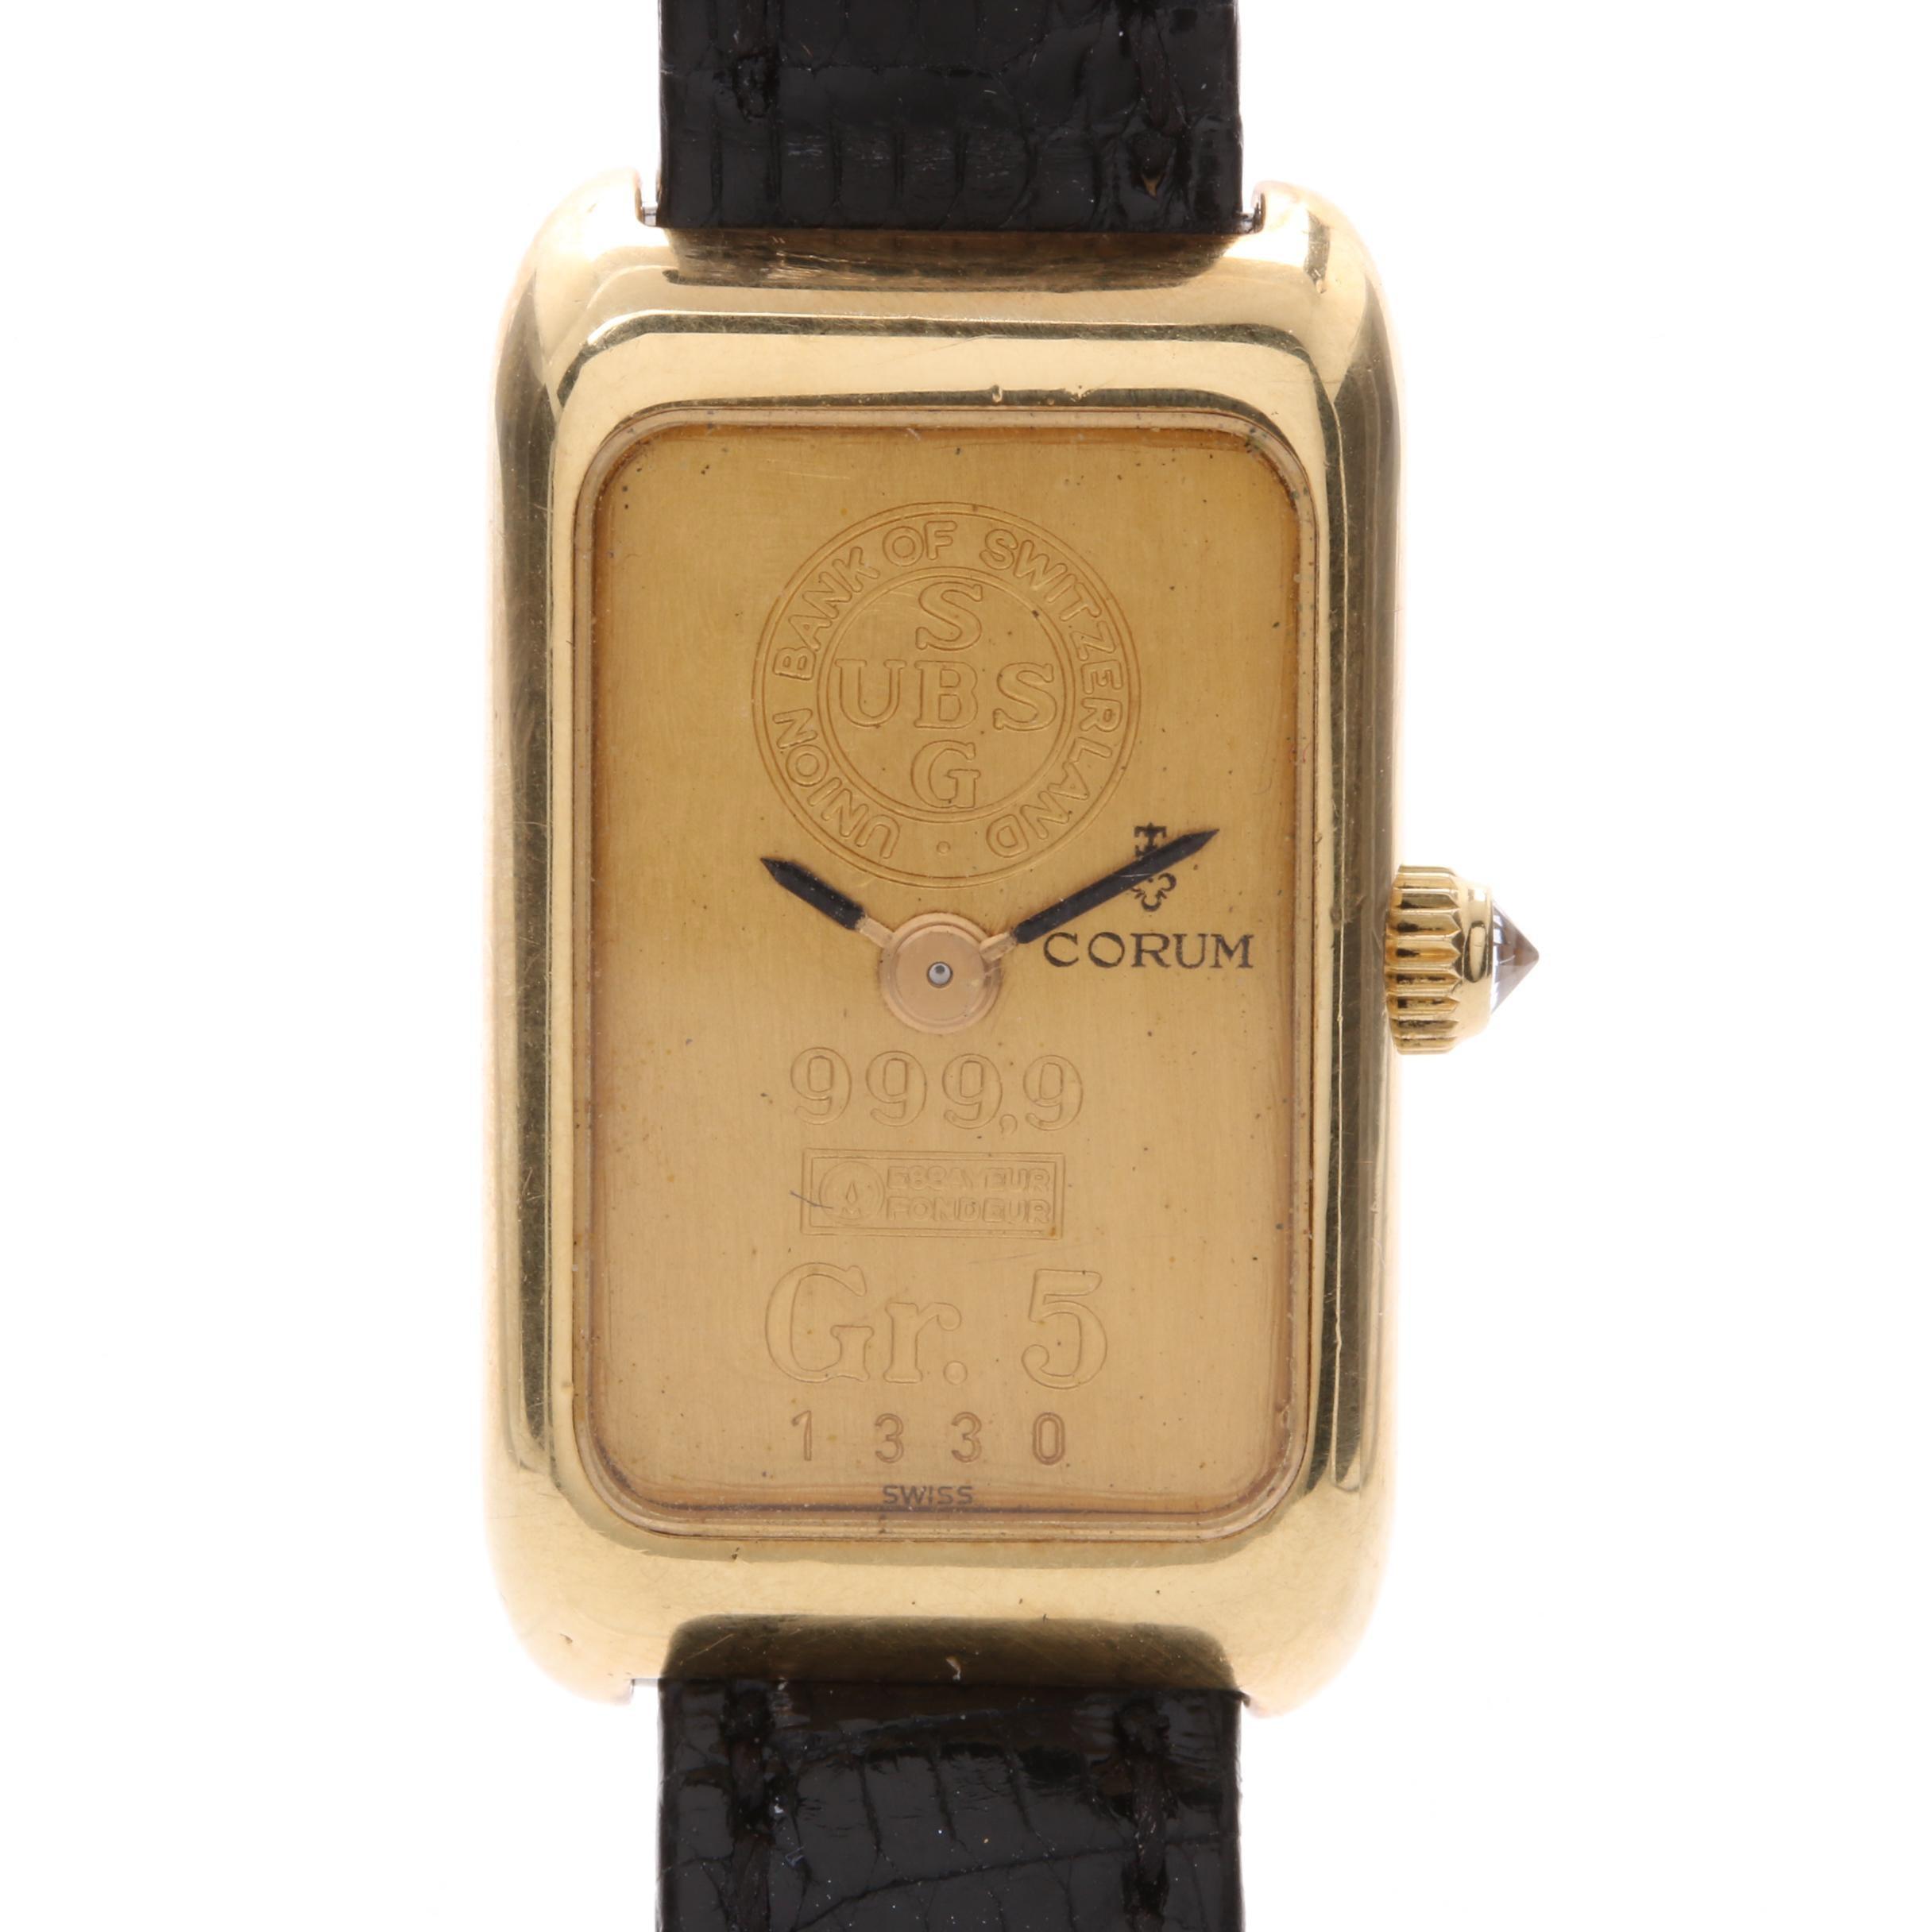 Corum 18K Yellow Gold with .999 Fine Gold Ingot Dial Wristwatch